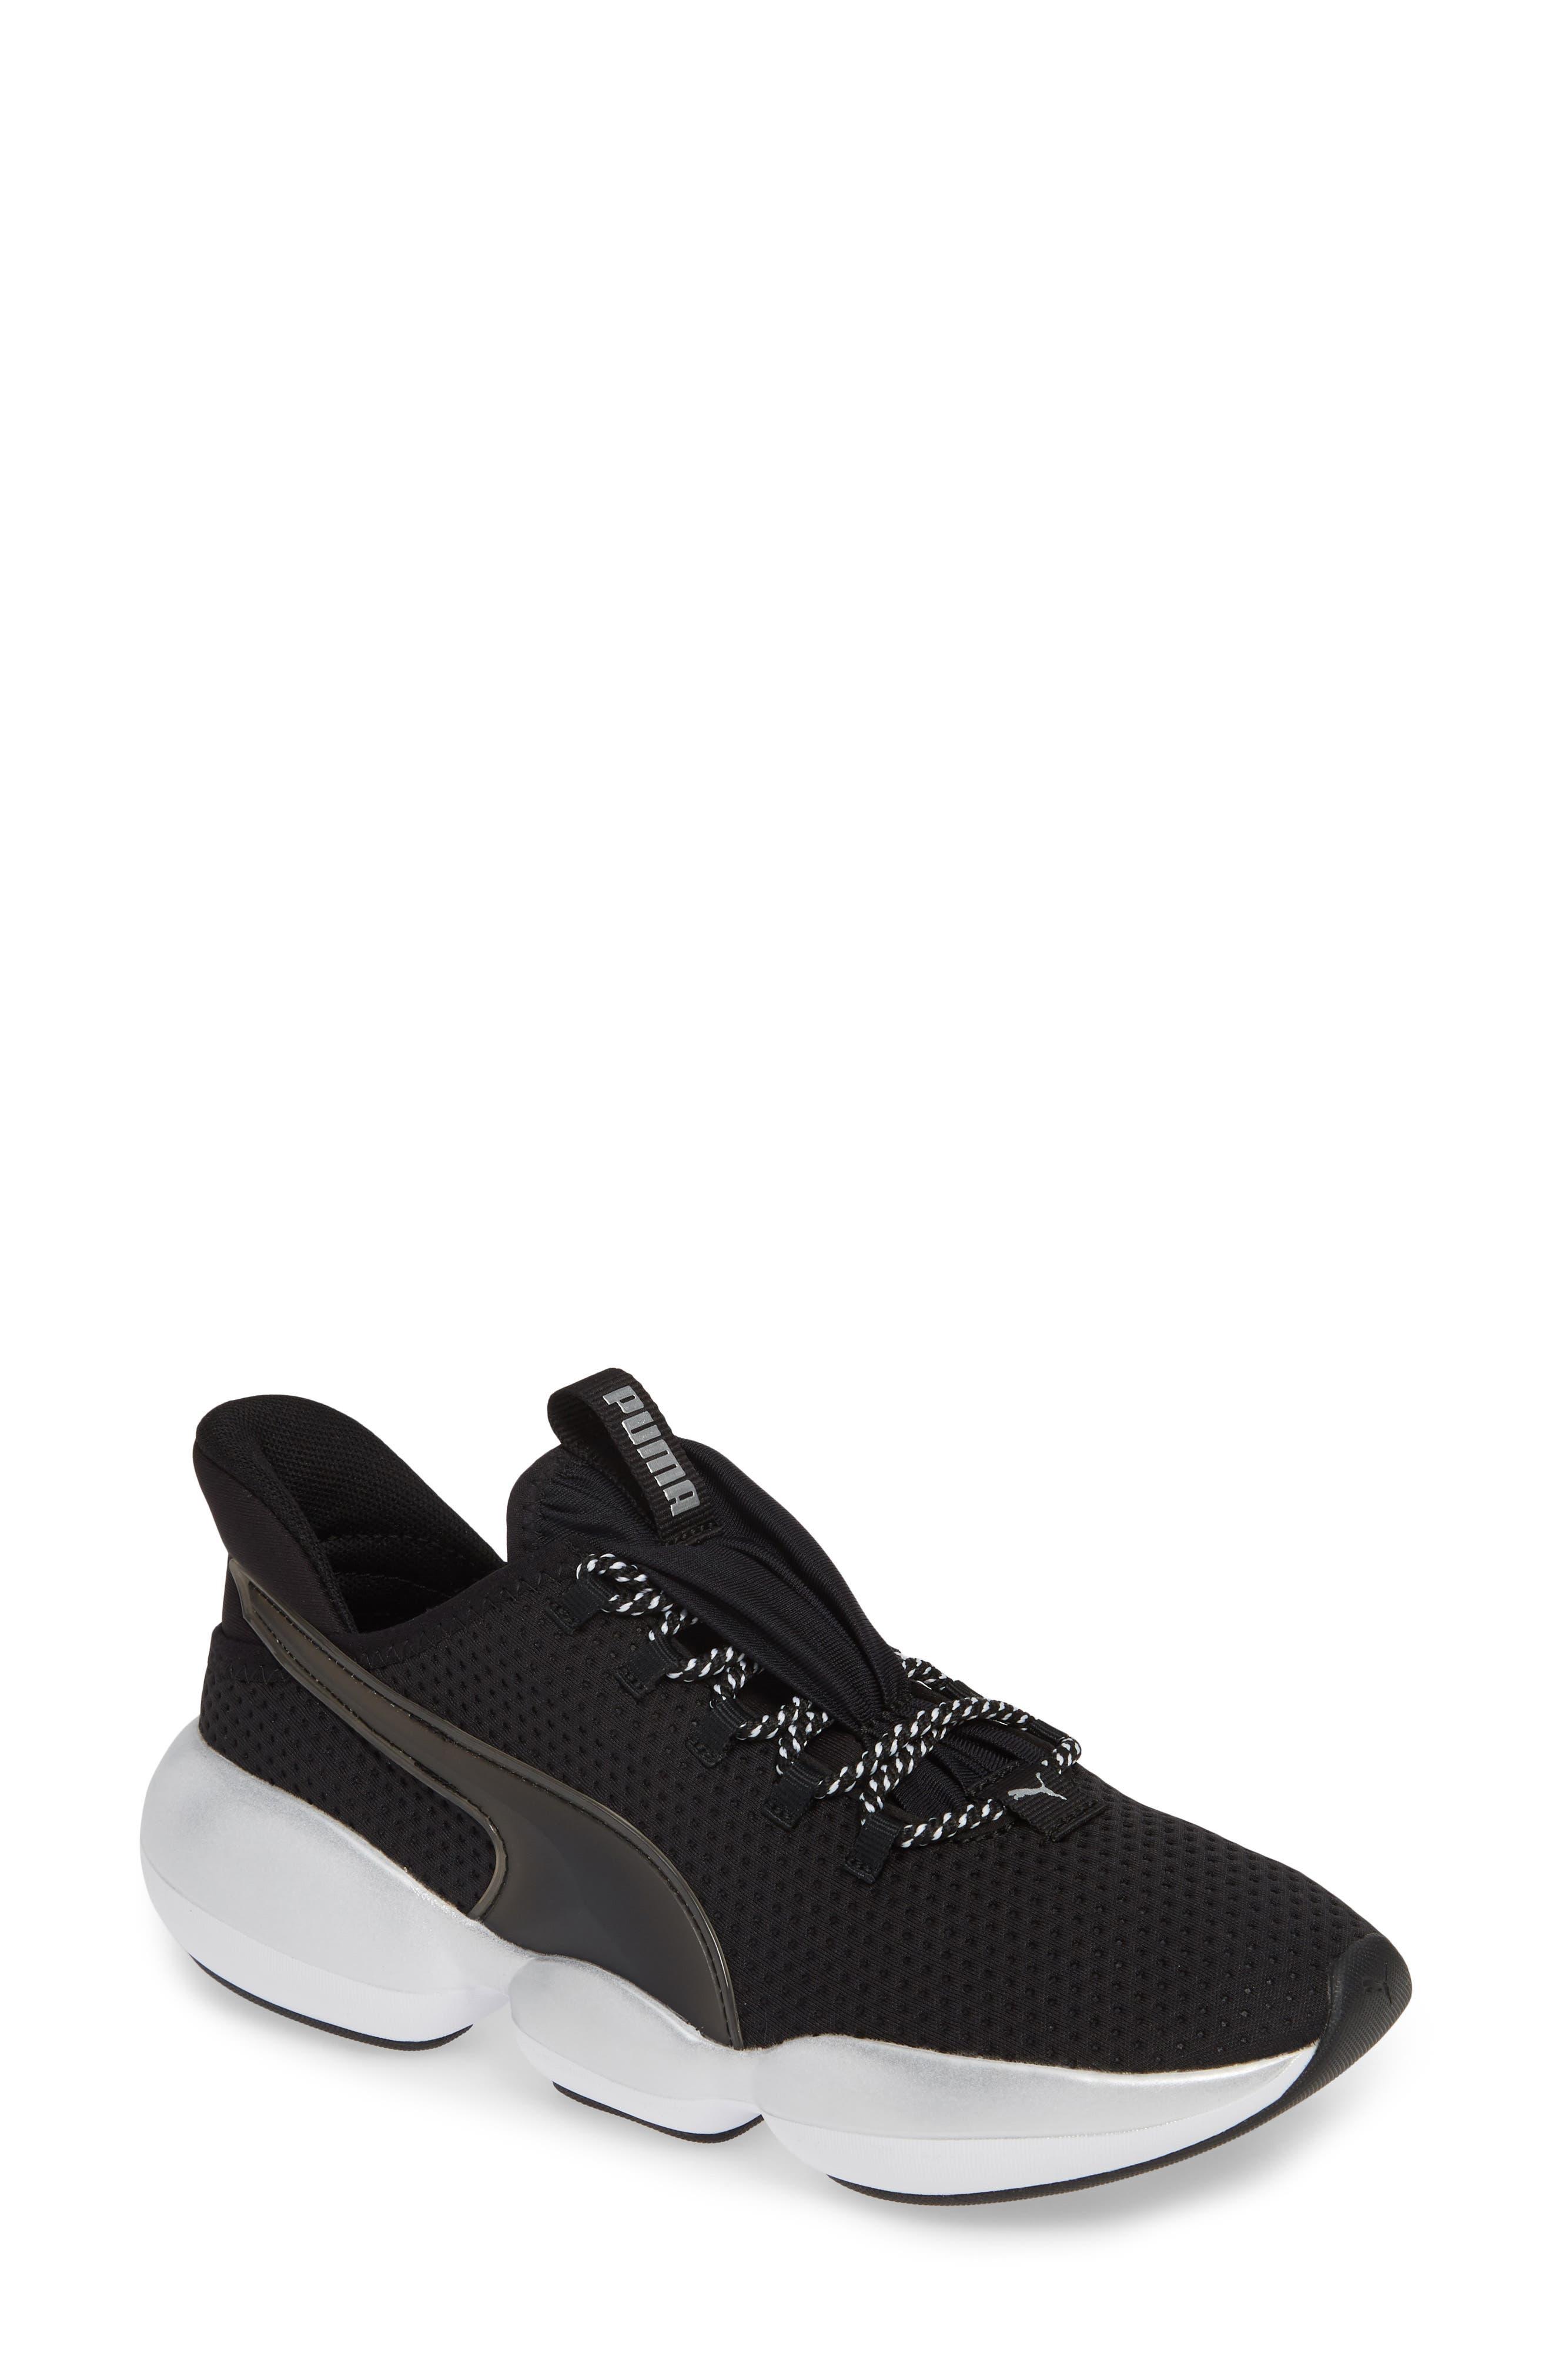 PUMA | Mode XT Hybrid Training Shoe